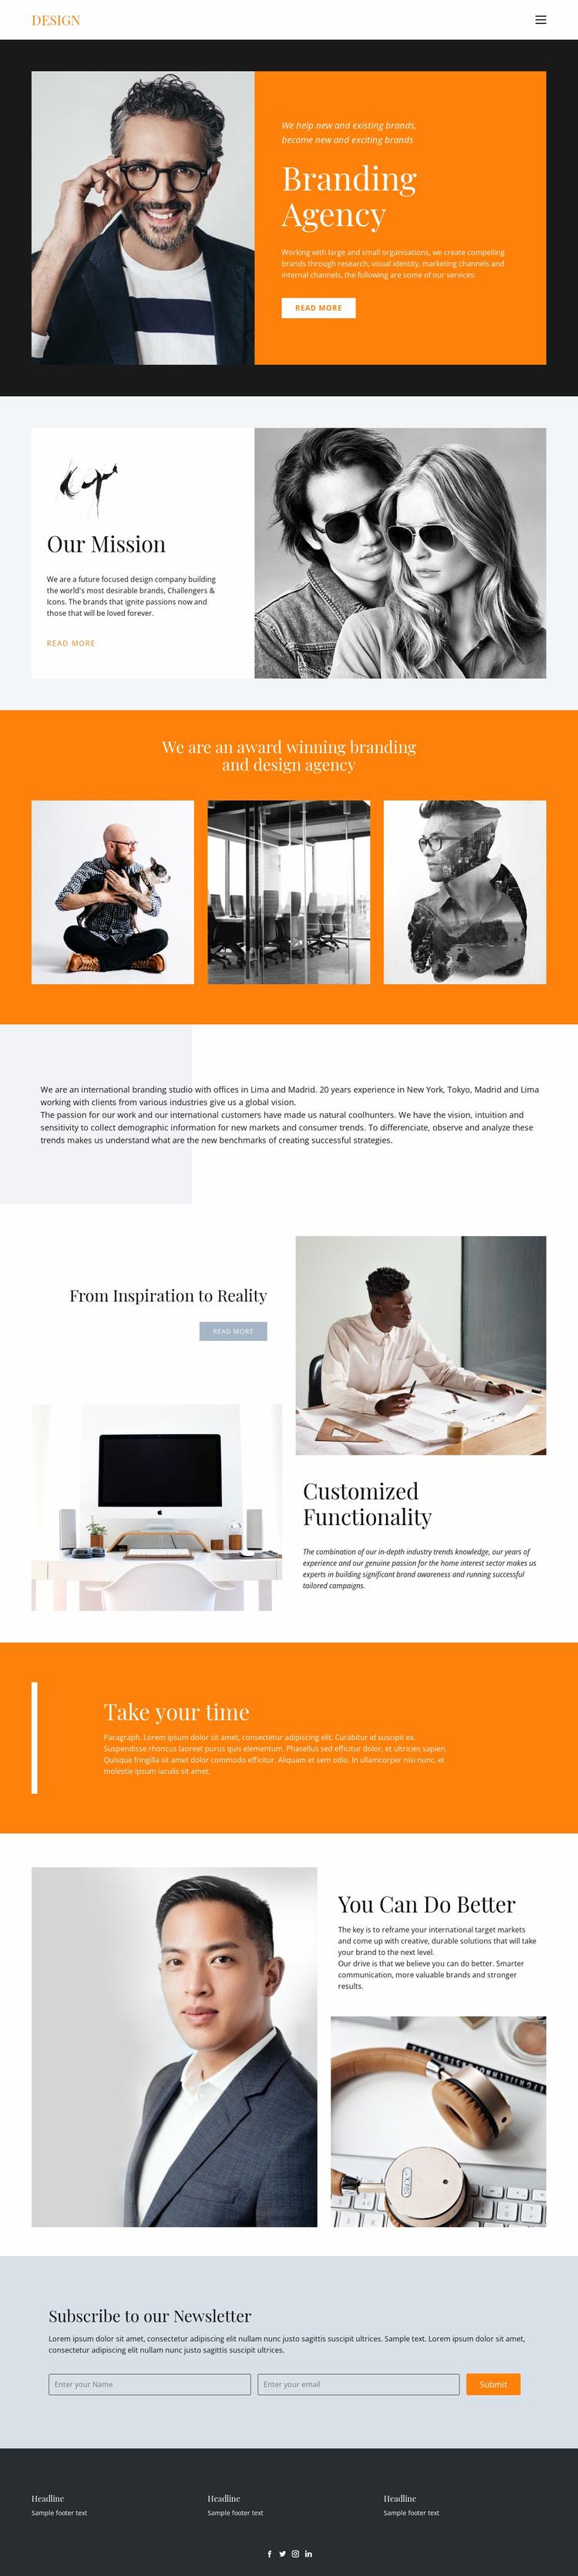 Desired results in business Website Design